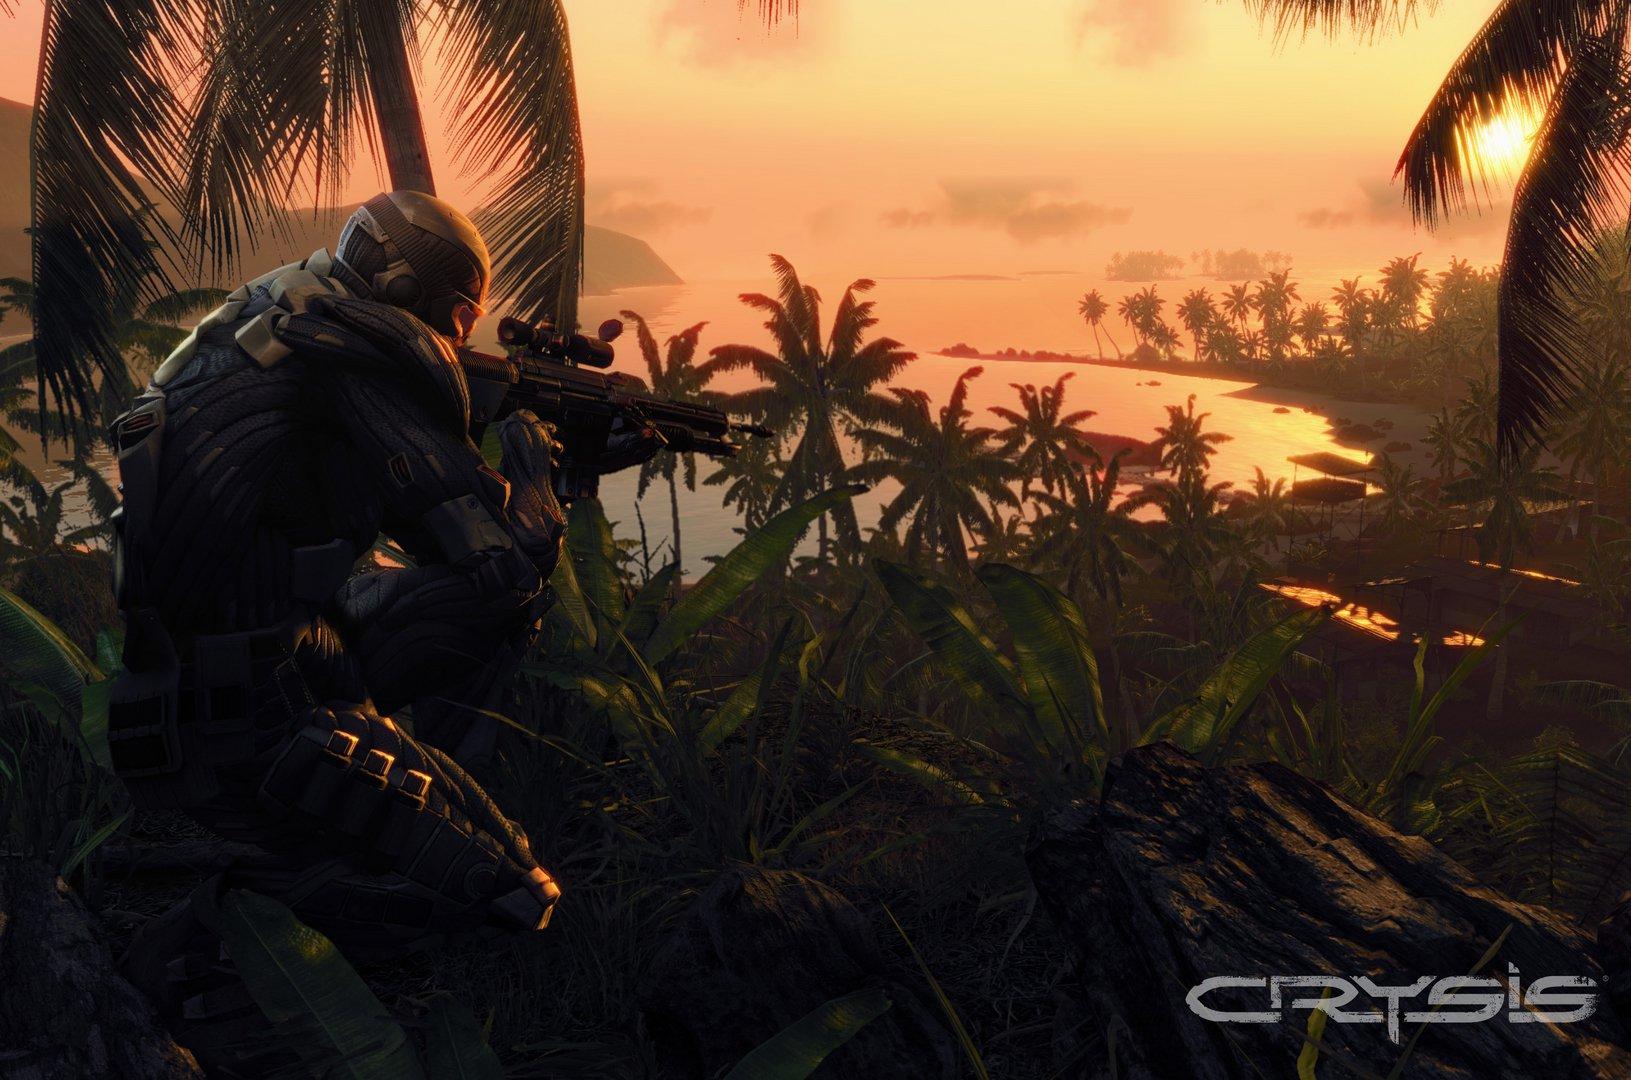 Crysis Maximum Edition 4